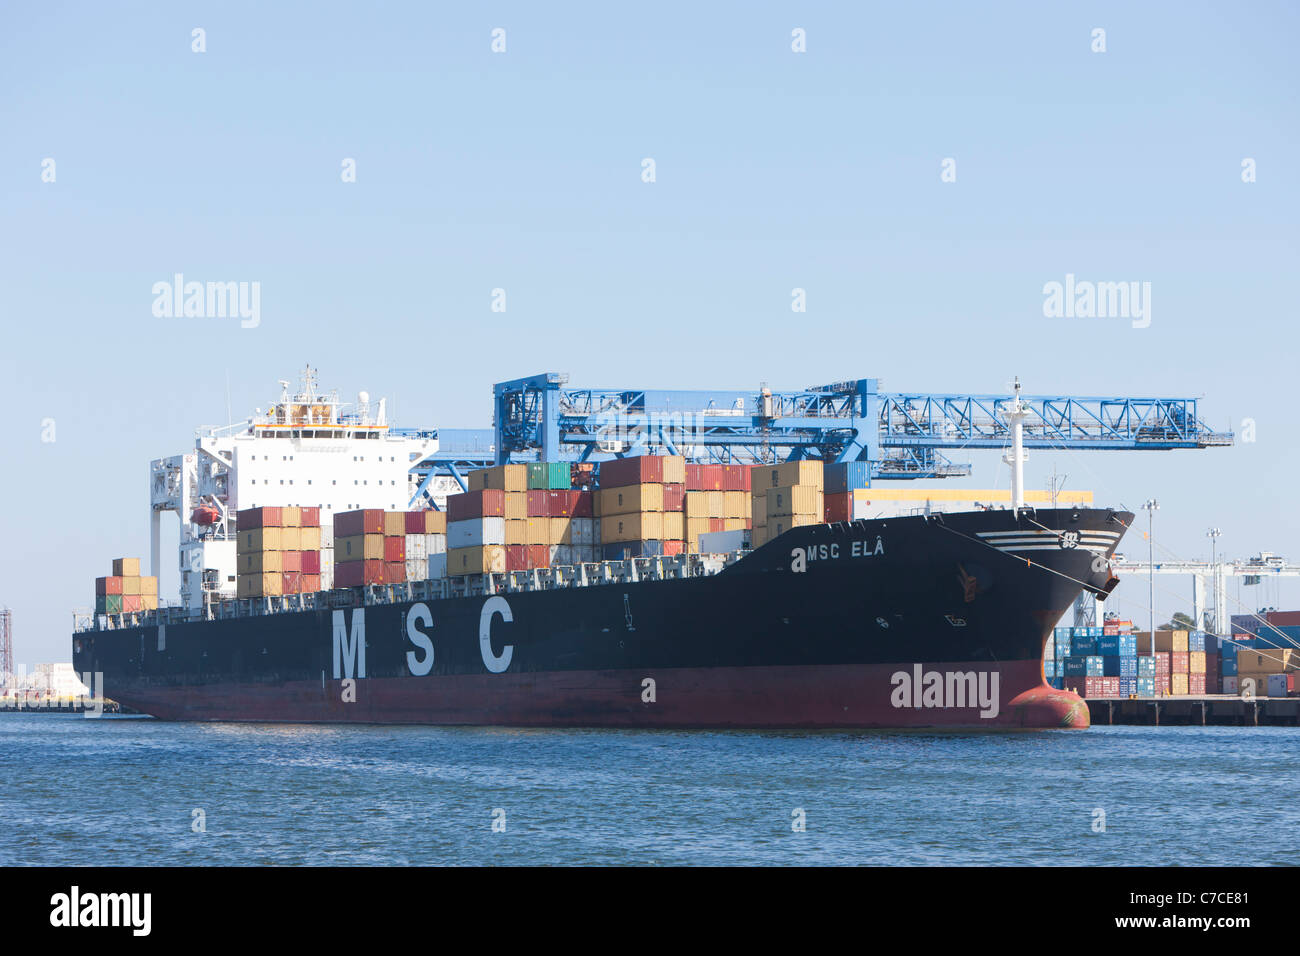 El MSC ELA buque contenedor en la Paul W. Conley Terminal en Boston, Massachusetts. Imagen De Stock